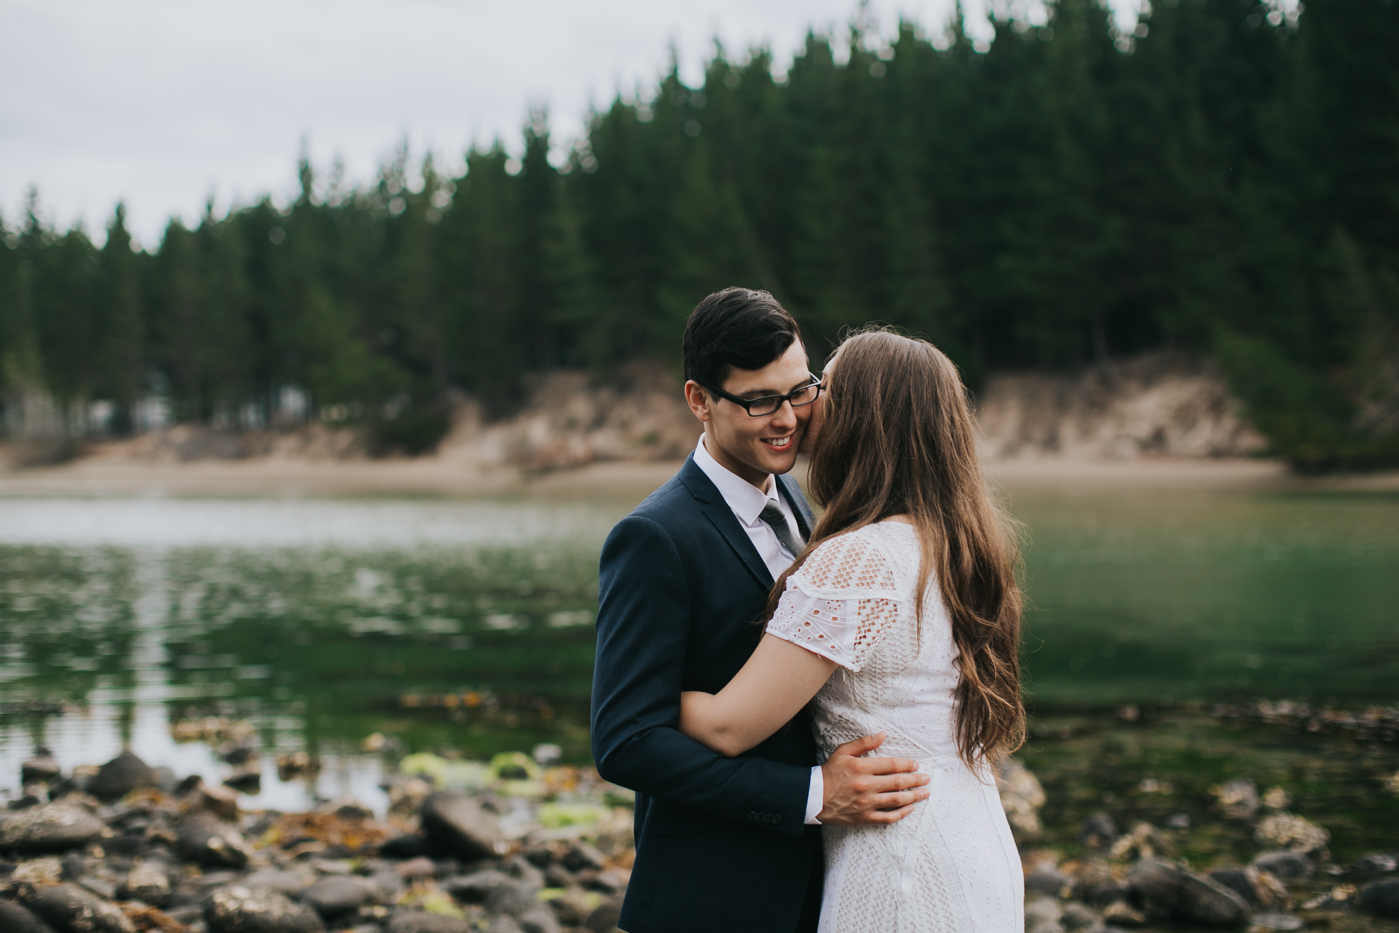 Ariana & Tim - Dunedin, New Zealand Wedding - Destination Wedding - Samantha Heather Photography-189.jpg